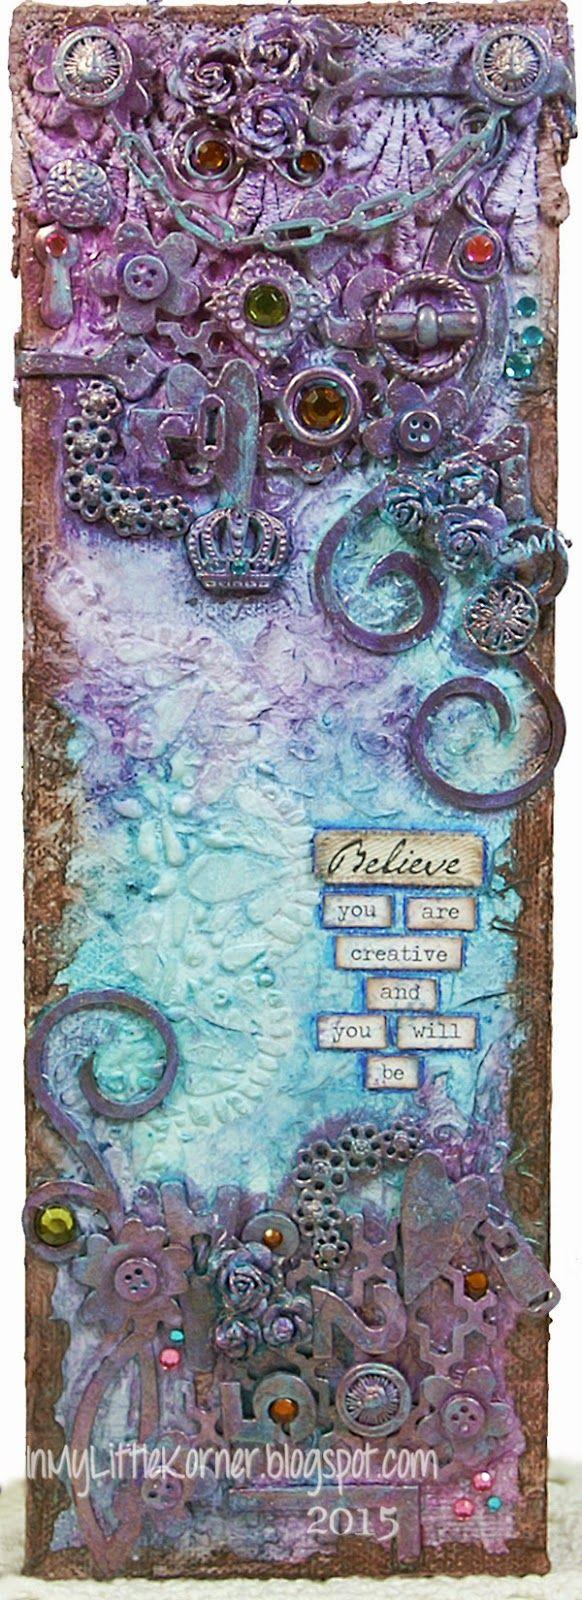 Mixed Media - Believe Canvas...